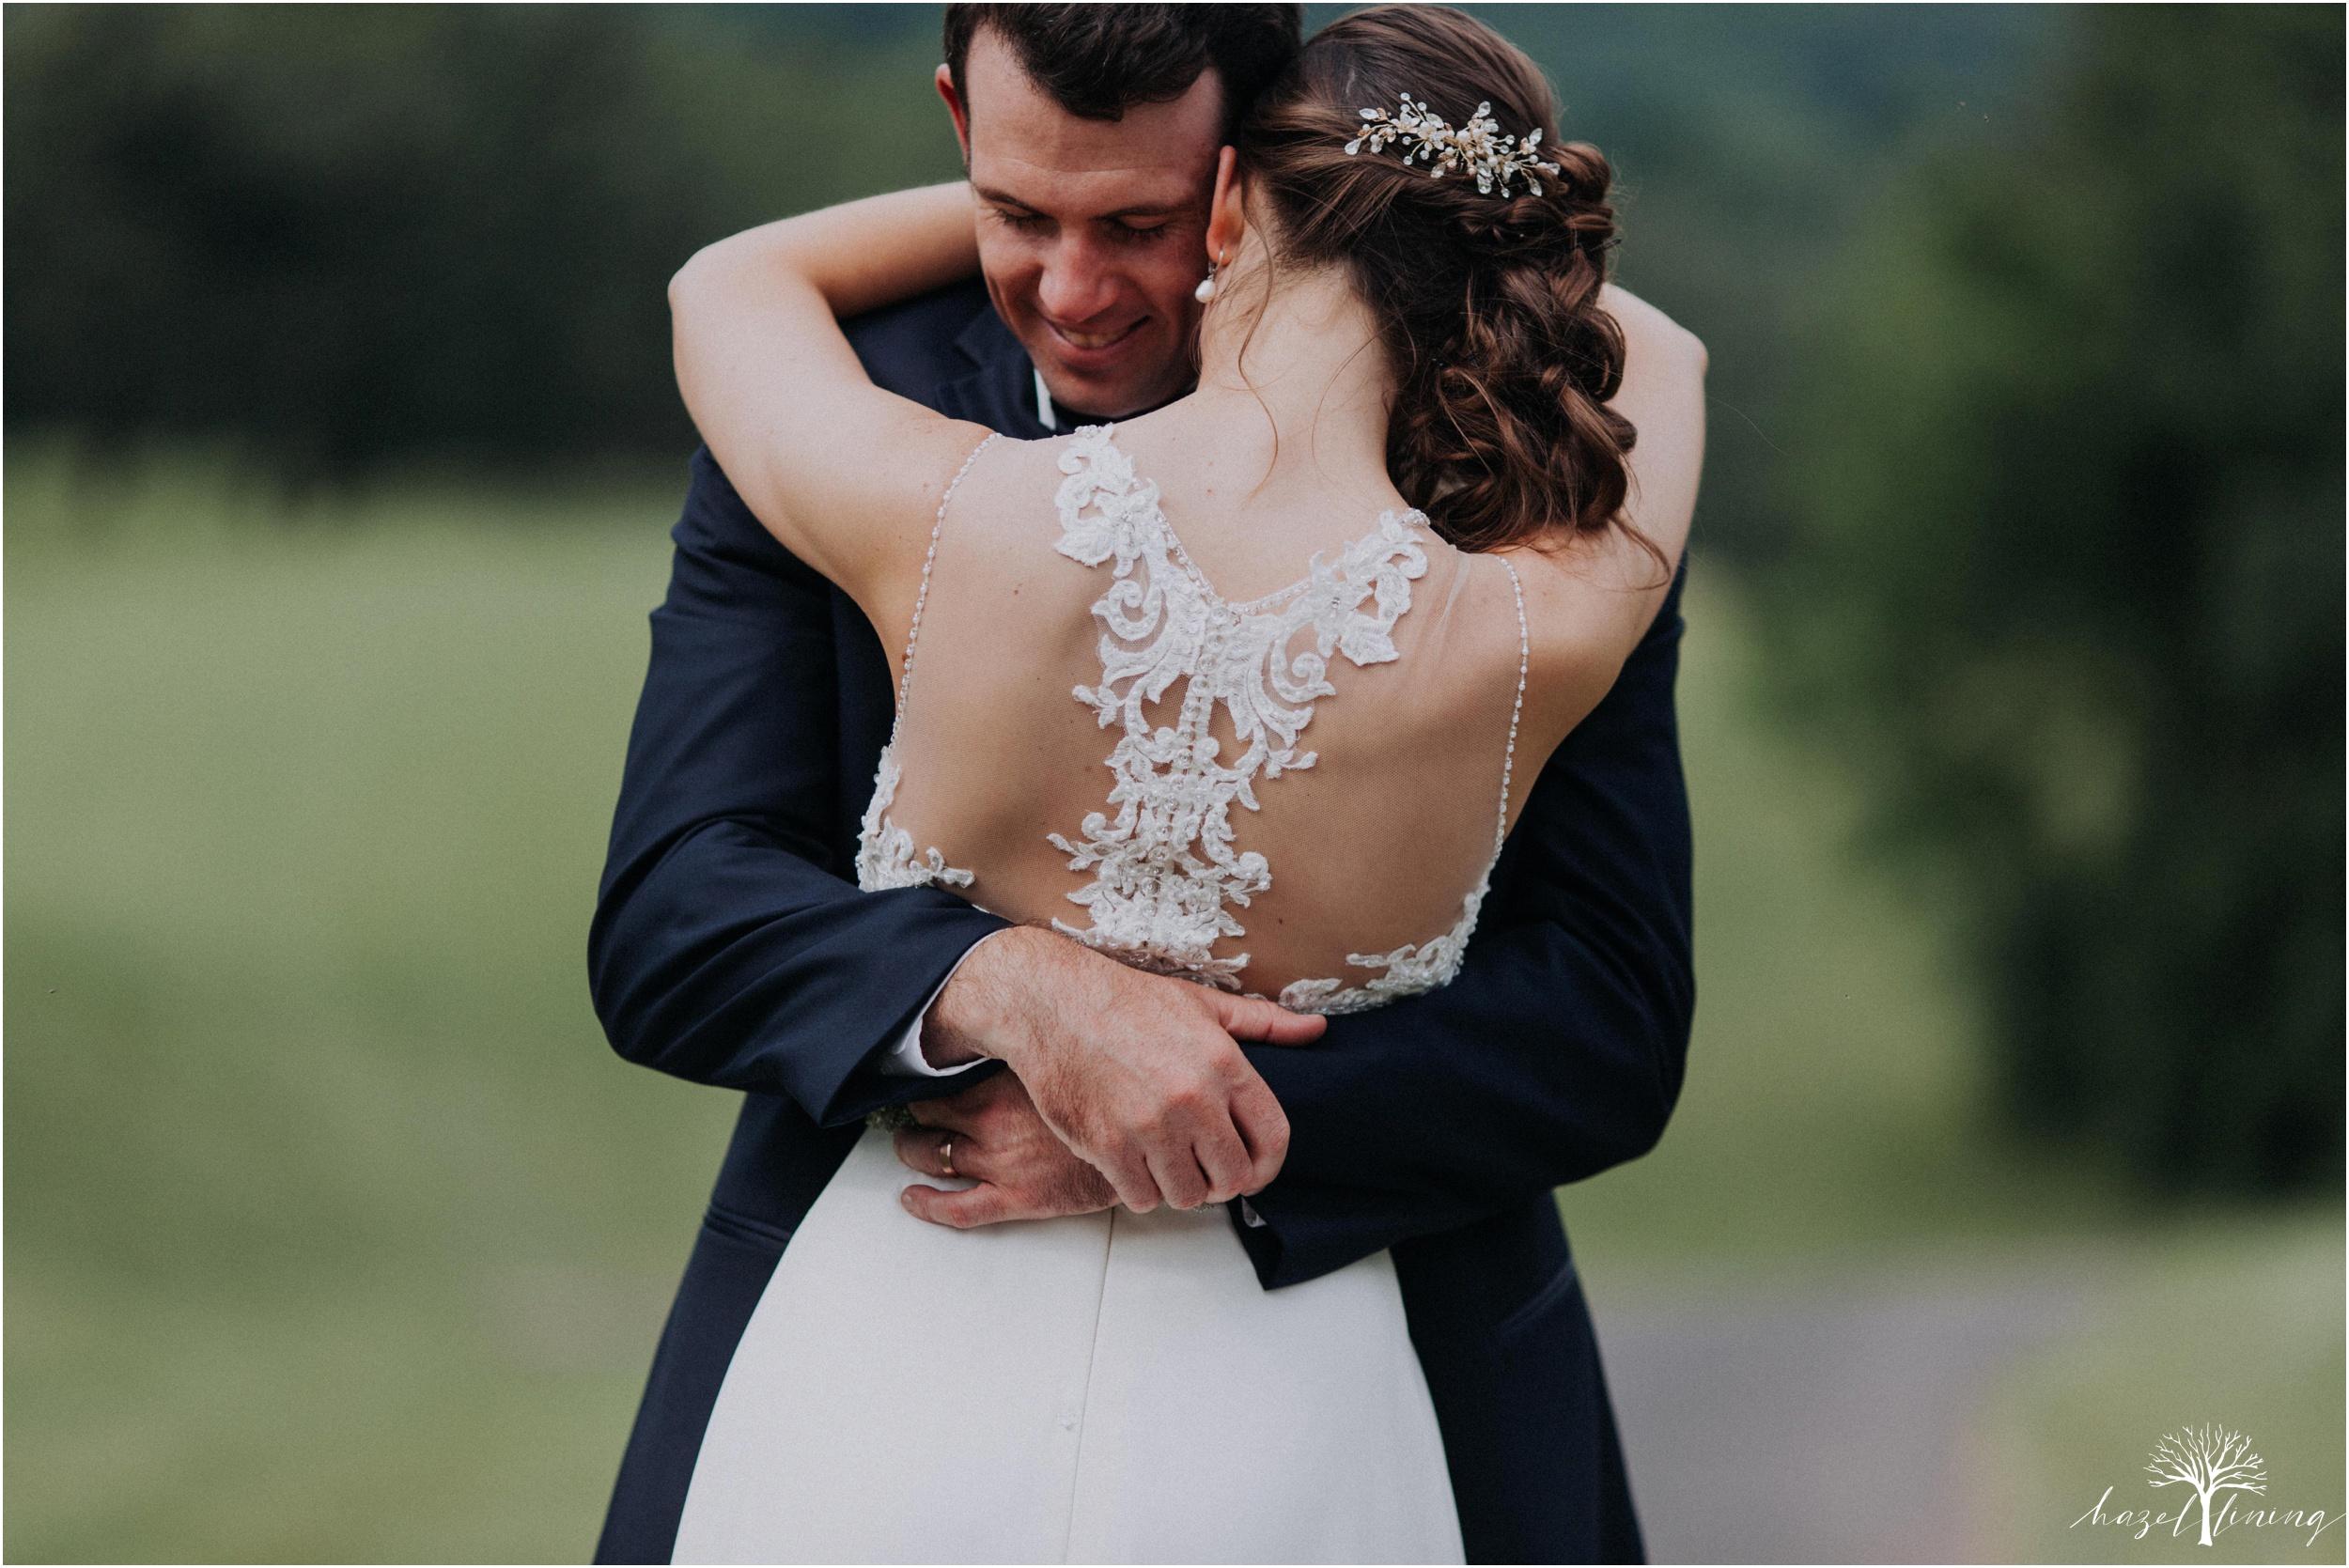 hazel-lining-travel-wedding-elopement-photography_0115.jpg